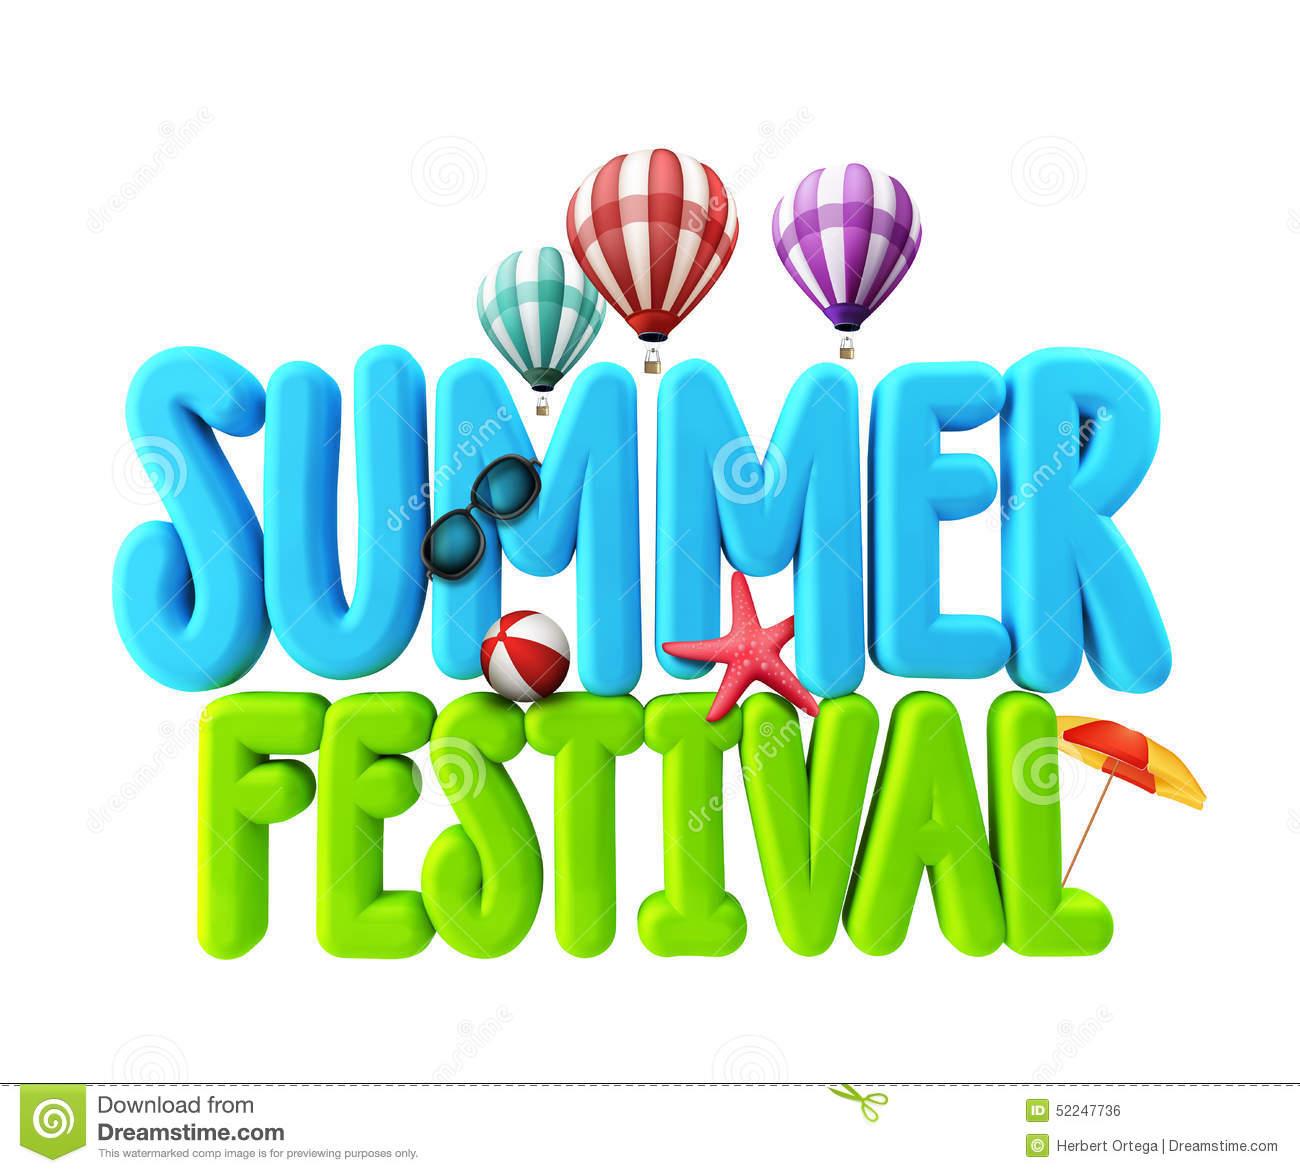 Festival clipart dandiya Download Summer Clipart Festival Clipart